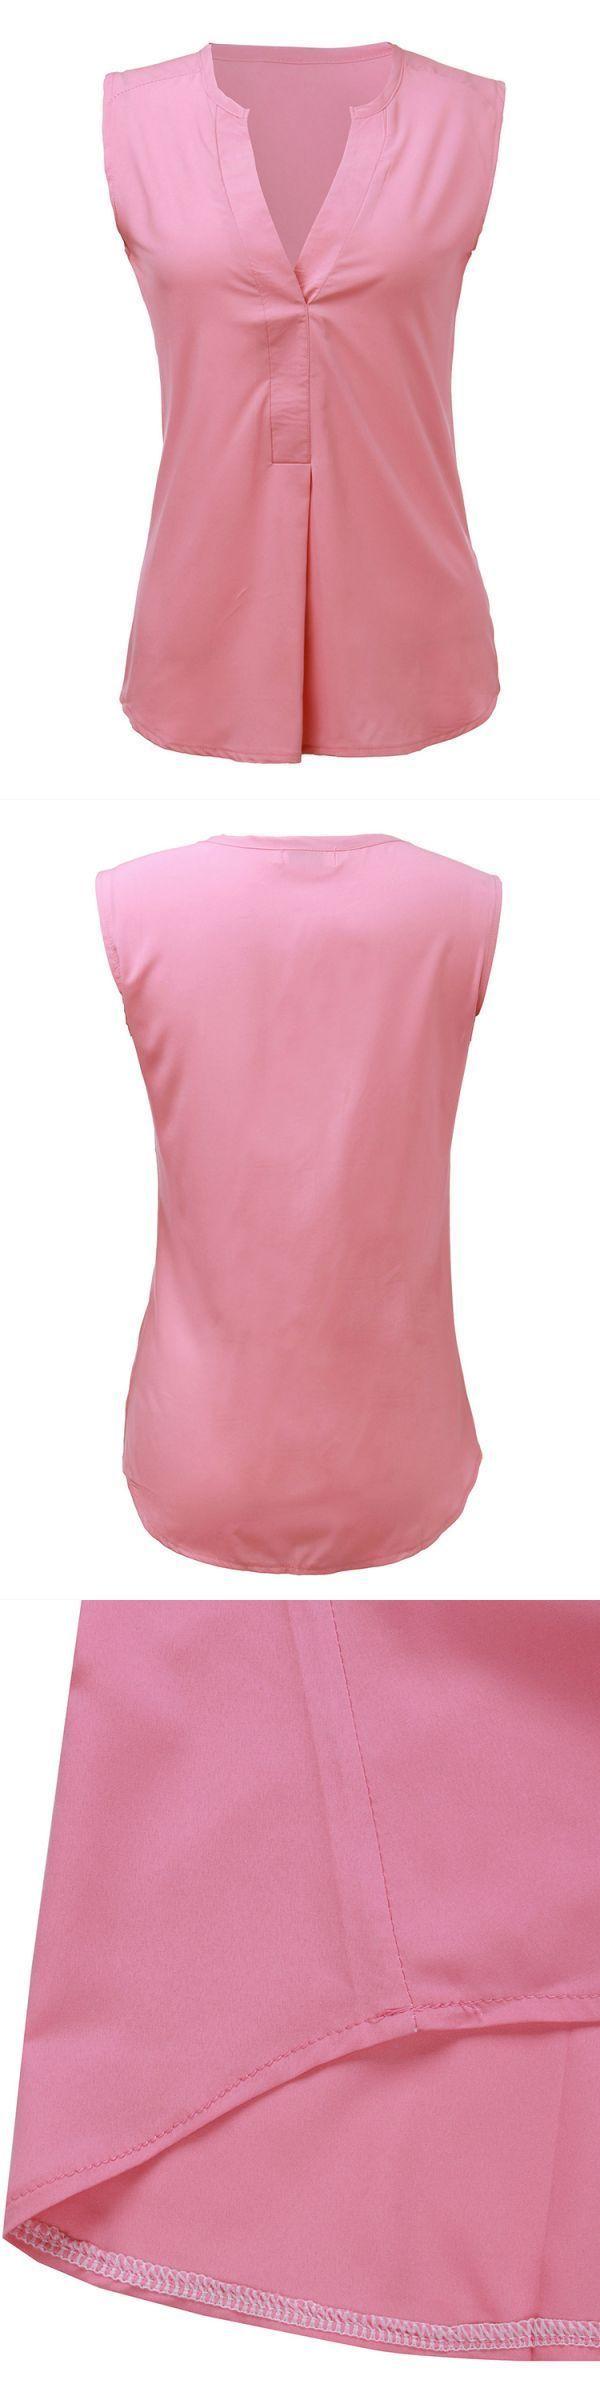 Womens kiss t shirts elegant women deep v neck sleeveless solid shirt t-shirt #flower #girl #t #shirts #uk #superwoman #t #shirt #t #shirt #quilt #girl #yooper #girl #t-shirts